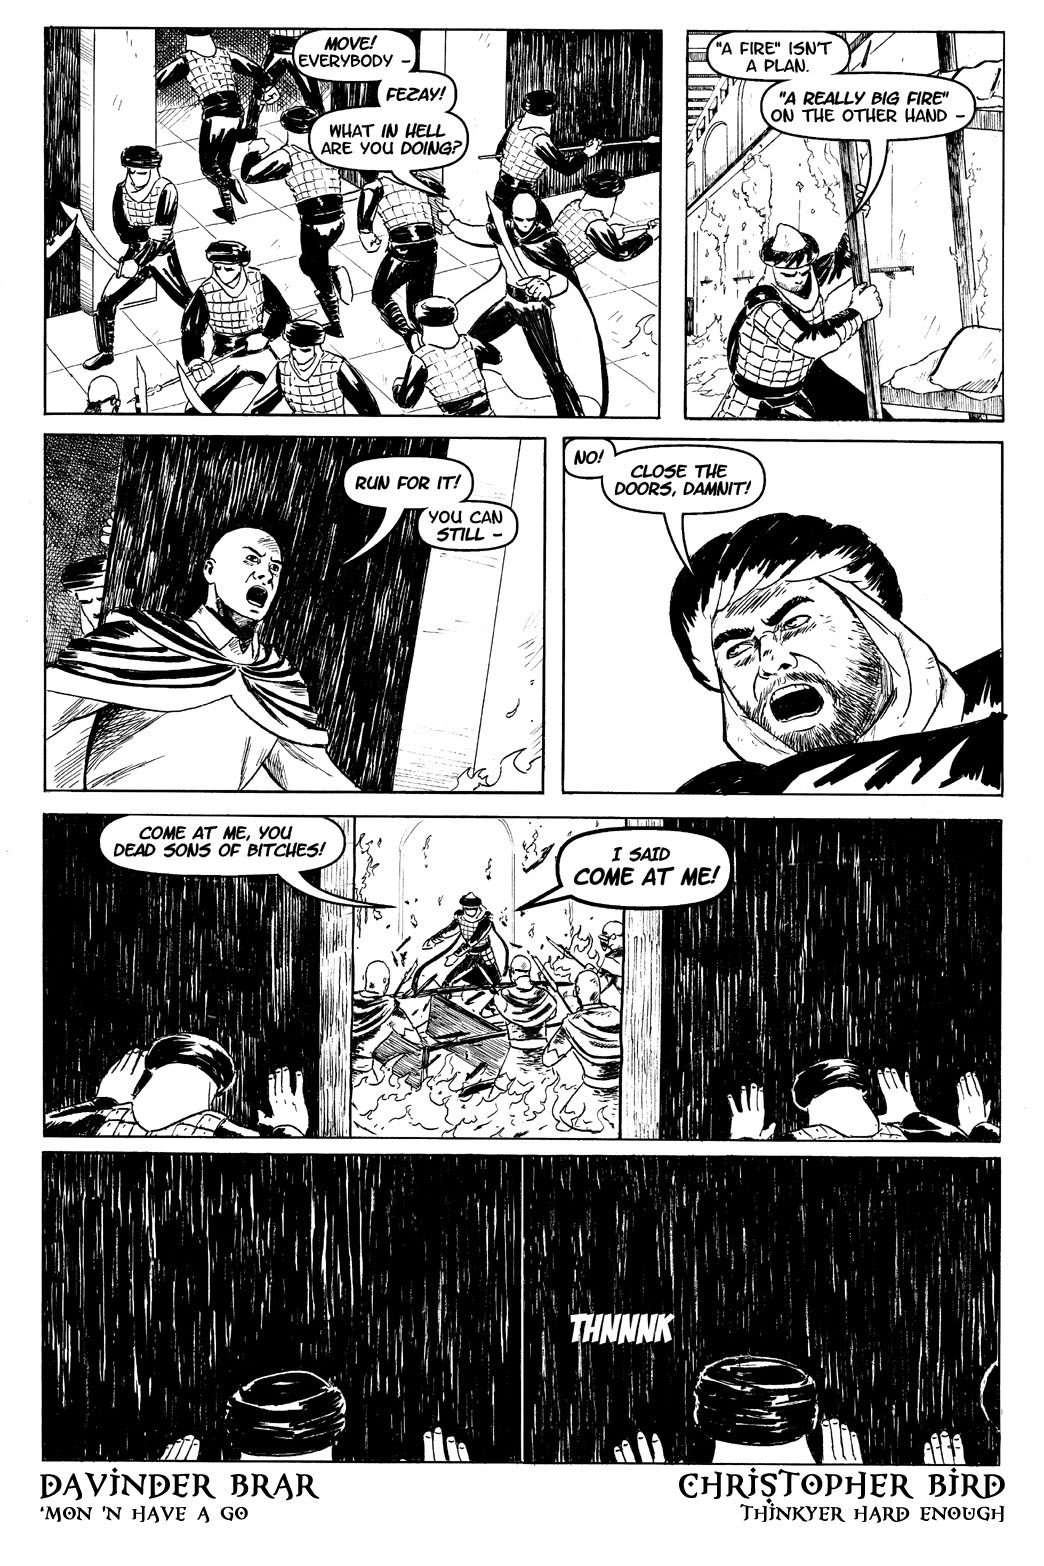 Book Five, Page Twenty-Three